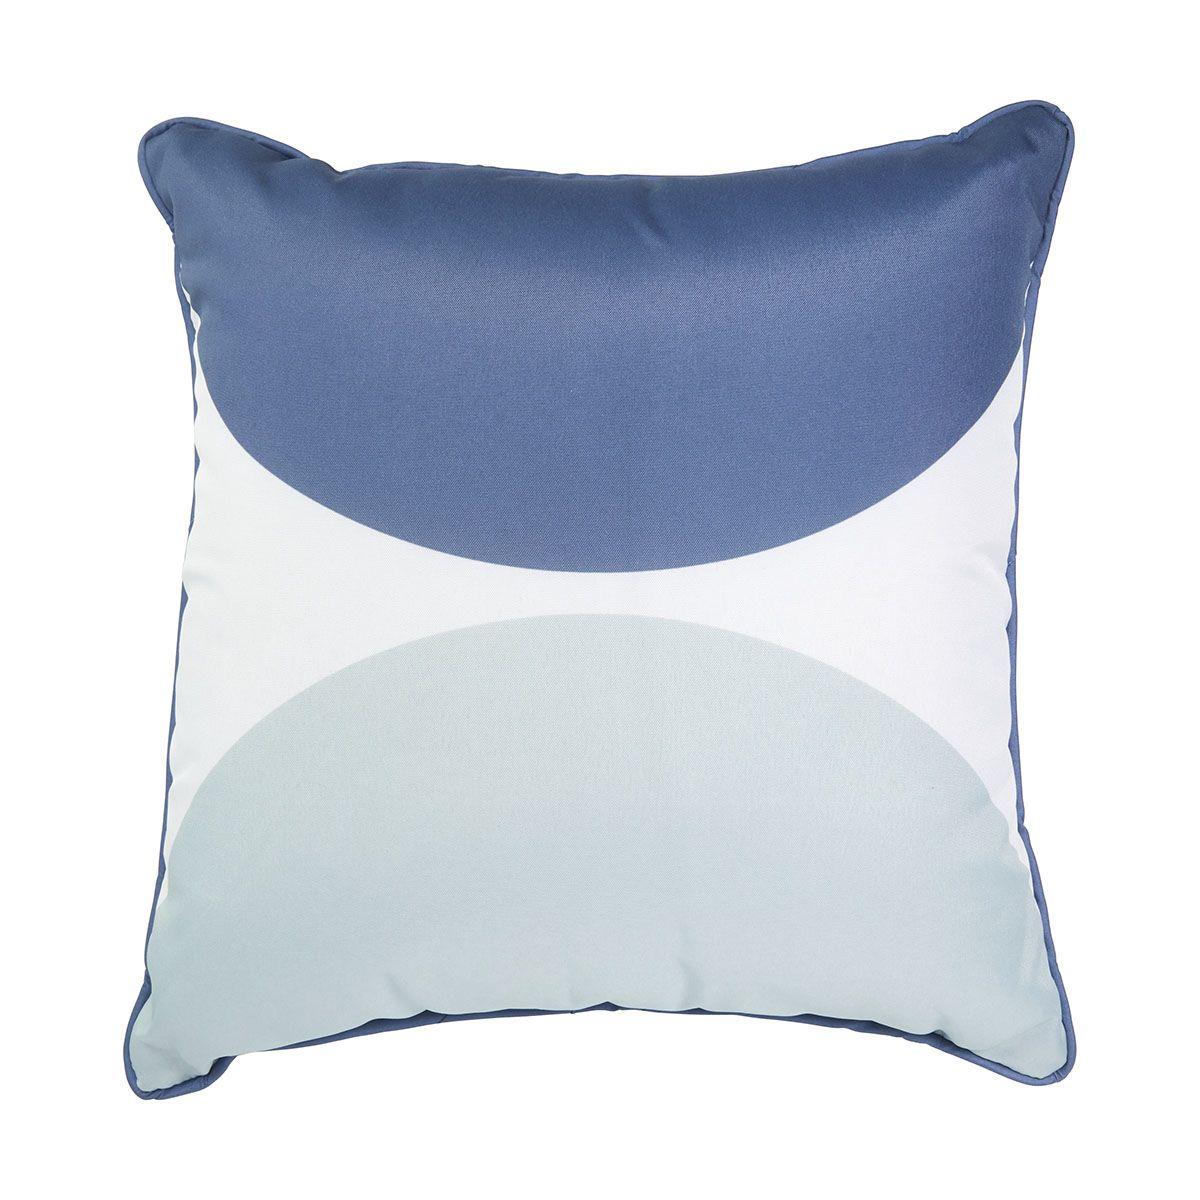 38cm Luna Outdoor Cushion Kmart Outdoor cushions